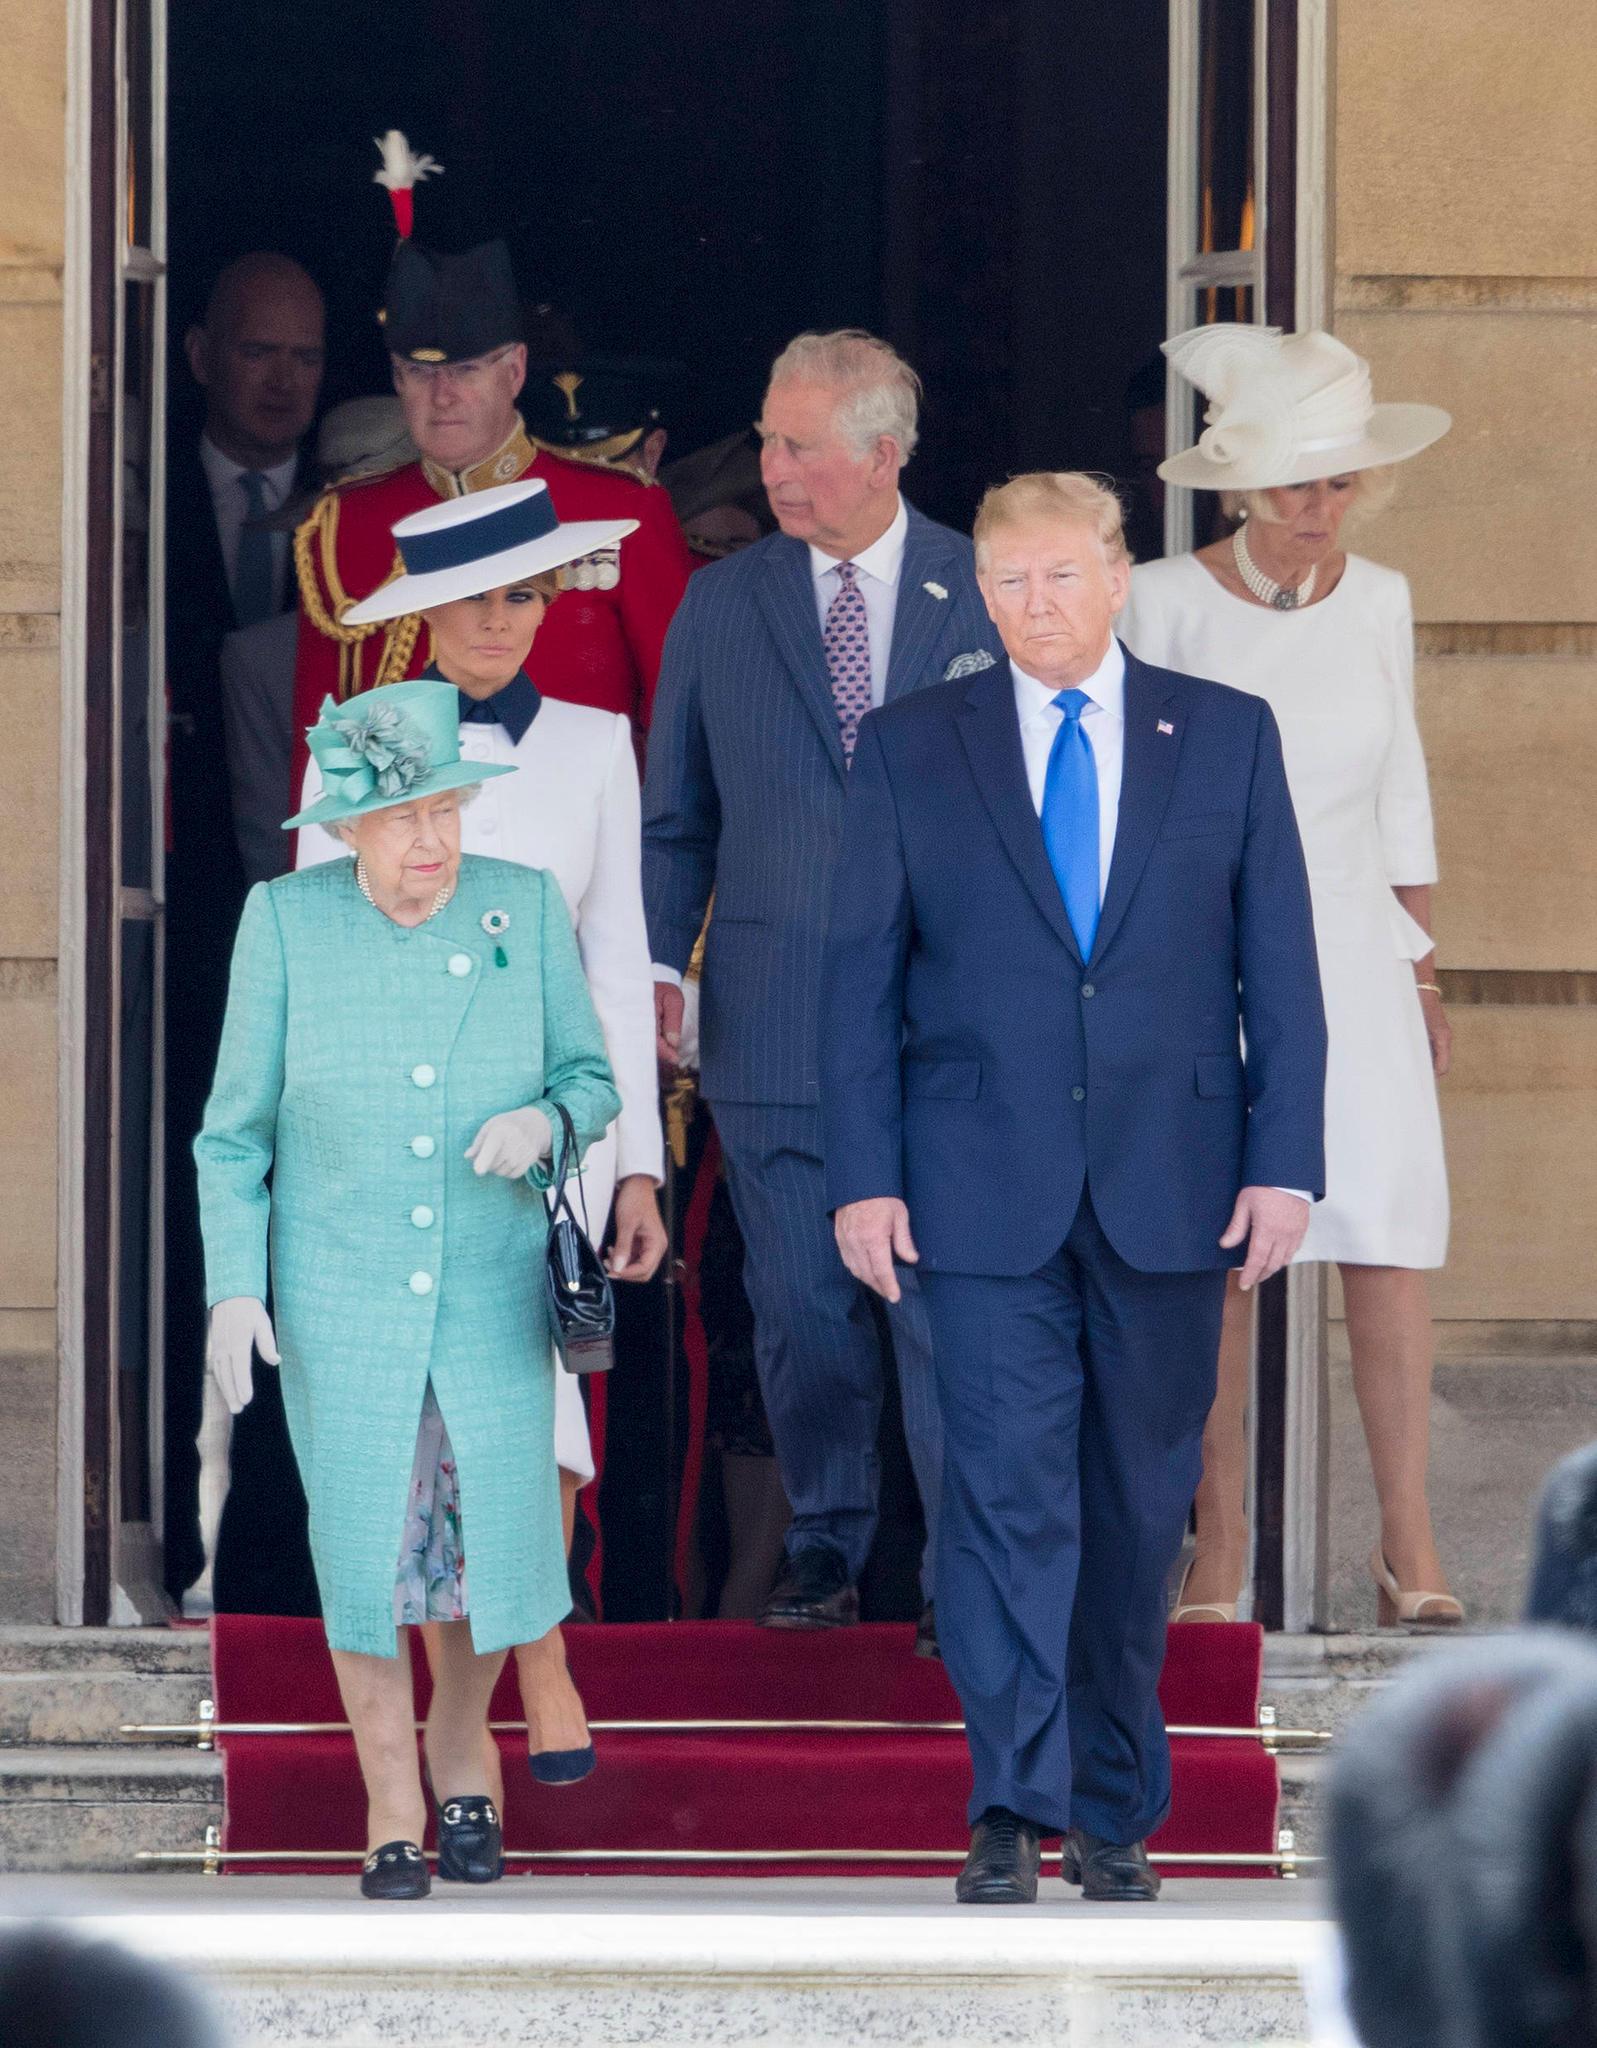 Queen Elizabeth, Donald Trump (vorne), Melania Trump, Prinz Charles, Herzogin Camilla (hinten)